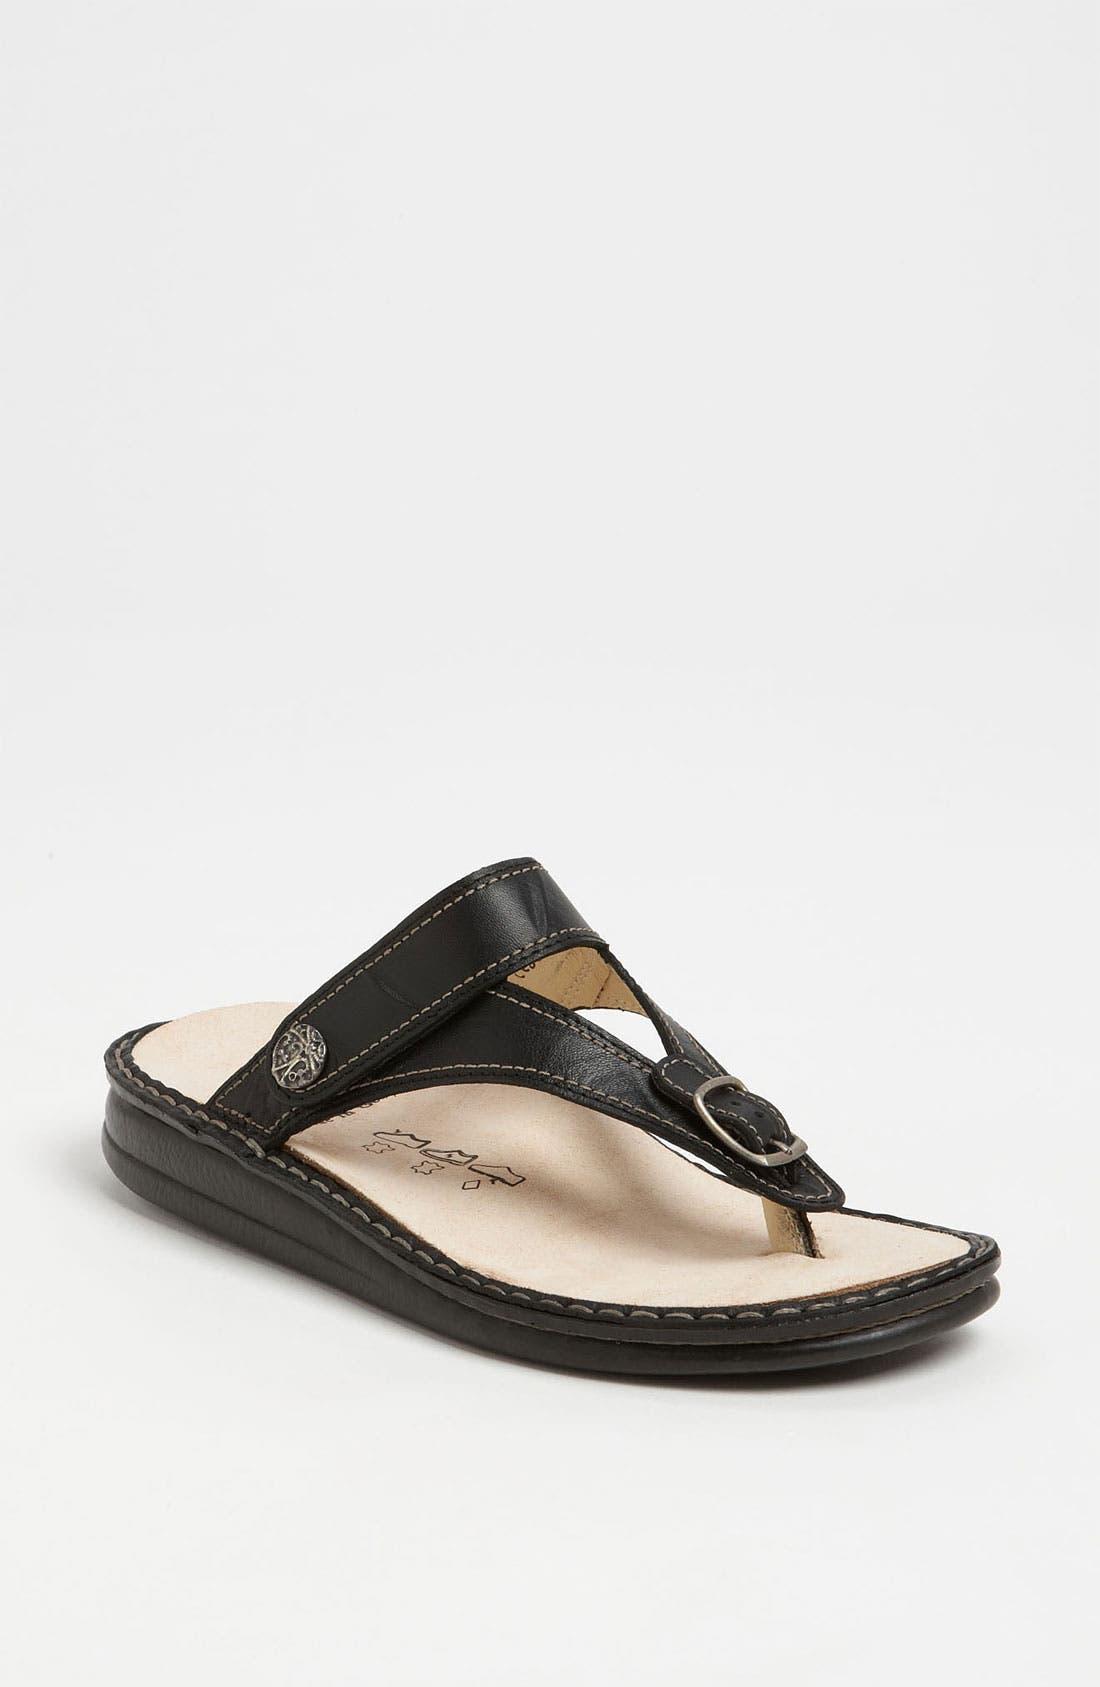 Alternate Image 1 Selected - Finn Comfort 'Alexandria' Thong Sandal